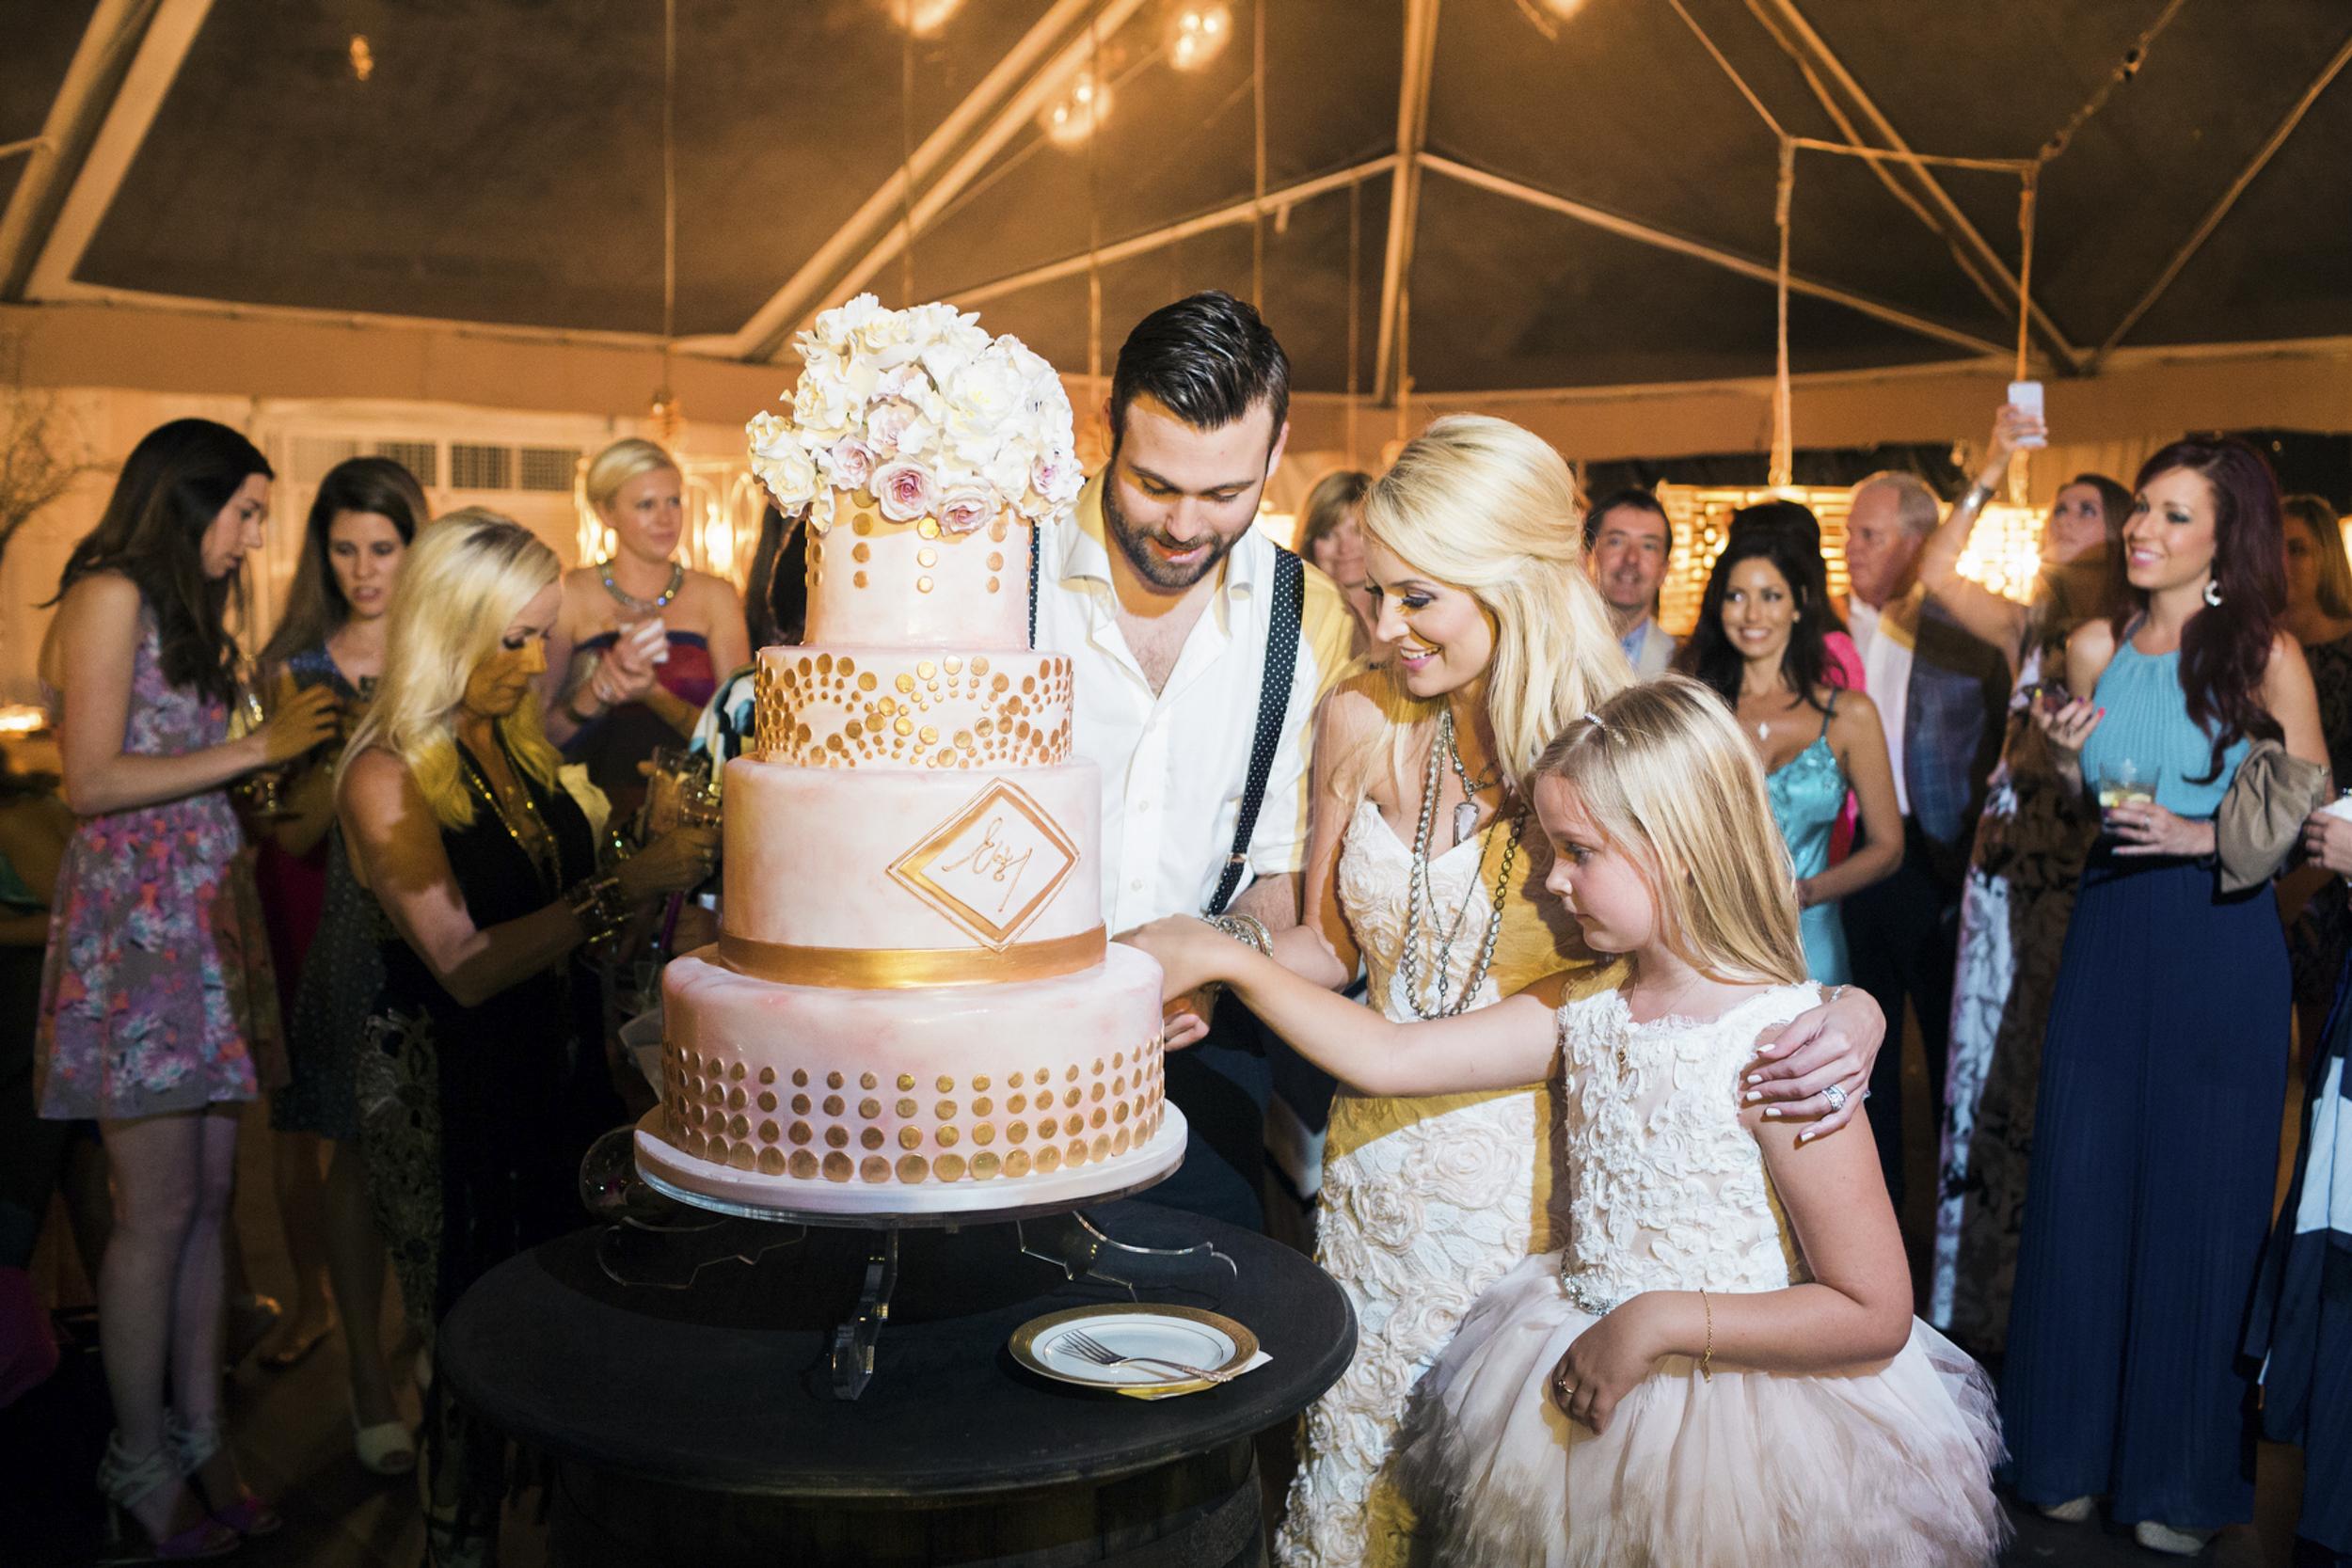 south_carolina_farm_wedding_rustic_chic_surprise_secret_luxe_wedding_bachelorette_emily_maynard_real_weddings-33.jpg